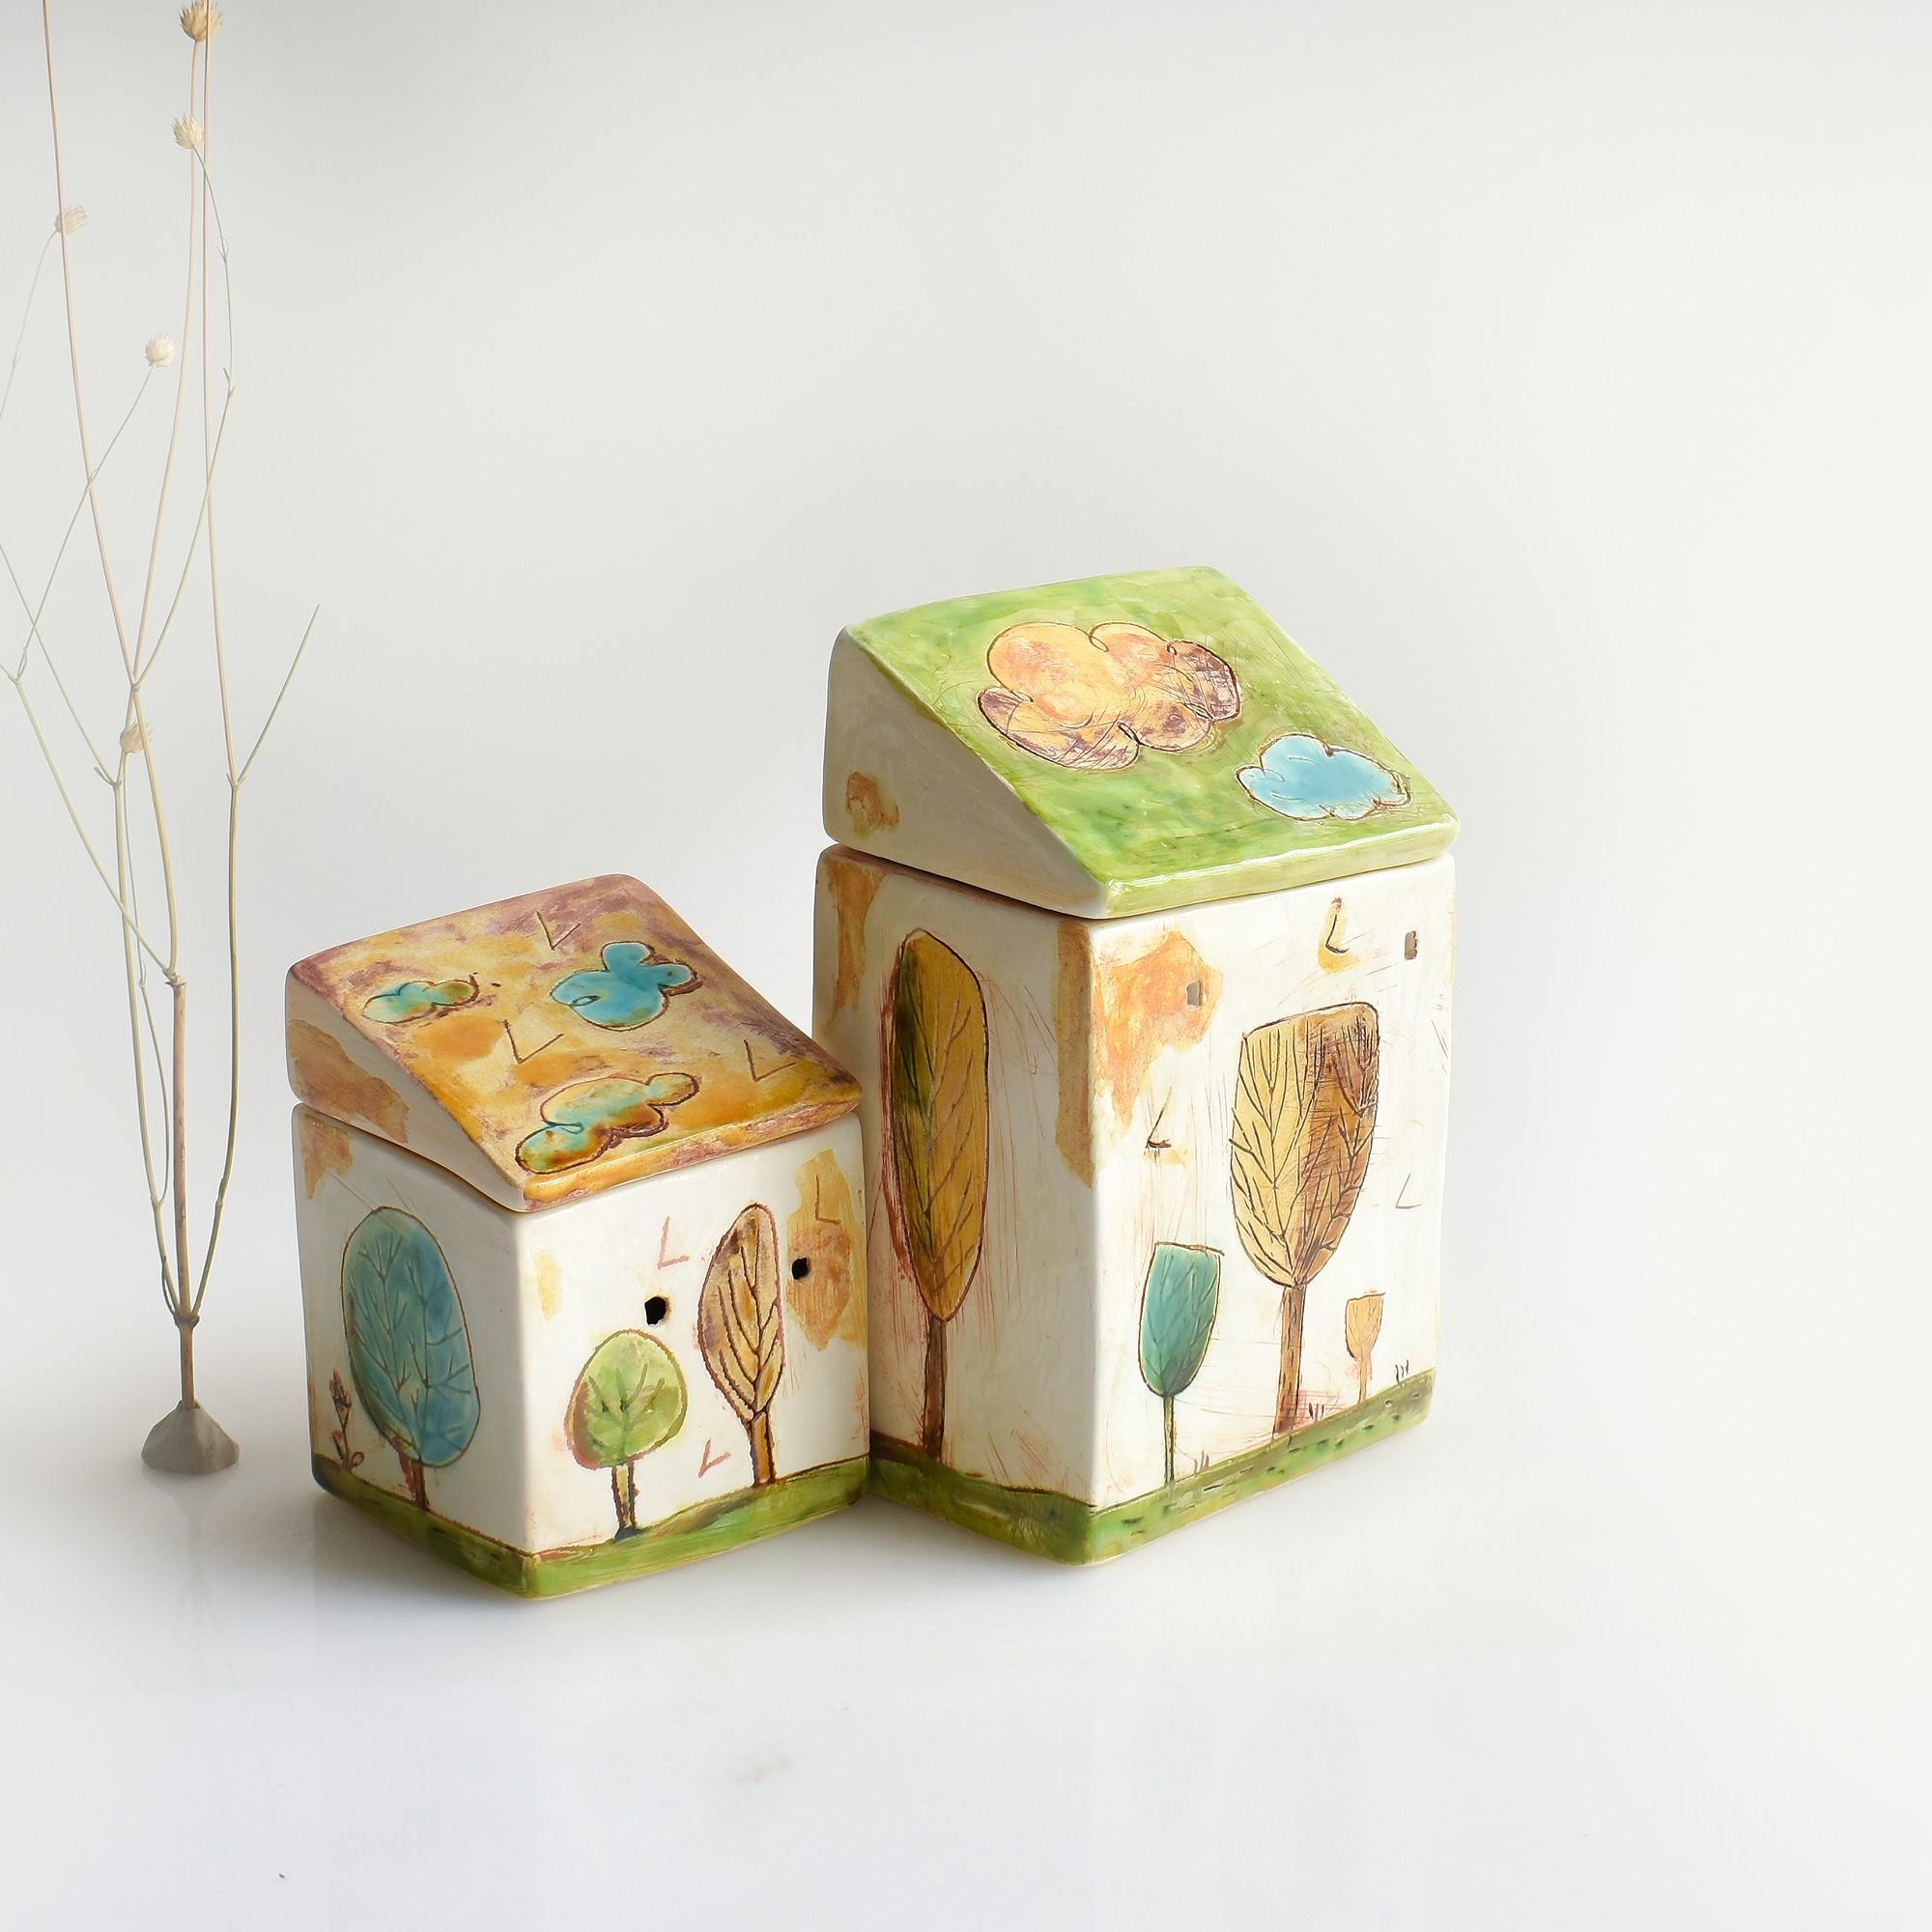 Case pădurete2